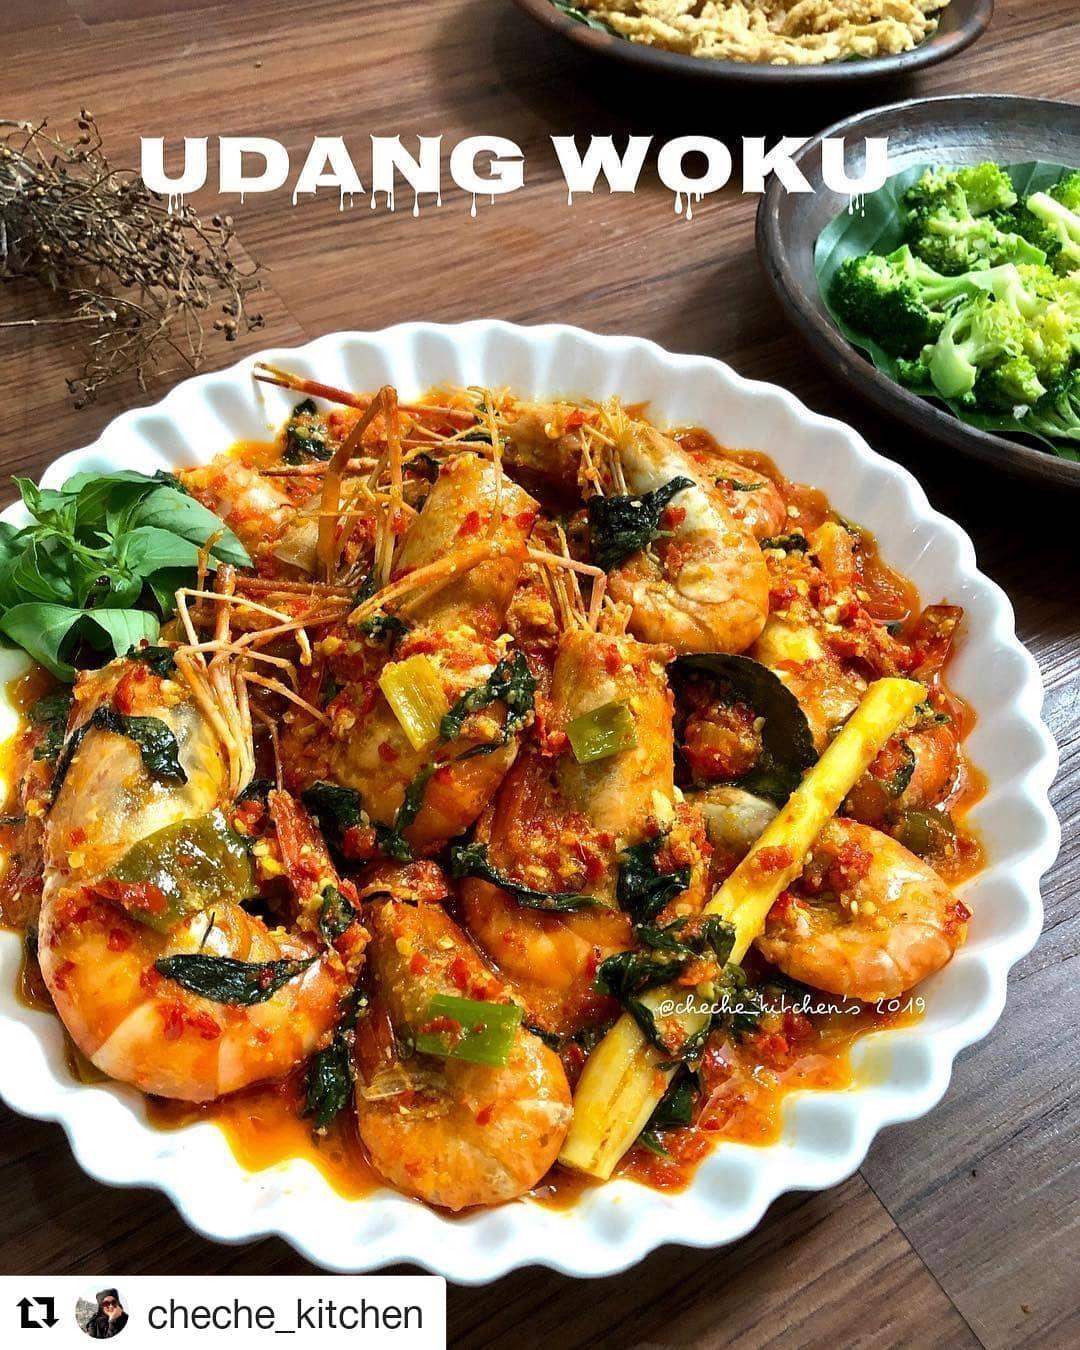 Udang Woku Resep Masakan Masakan Resep Makanan